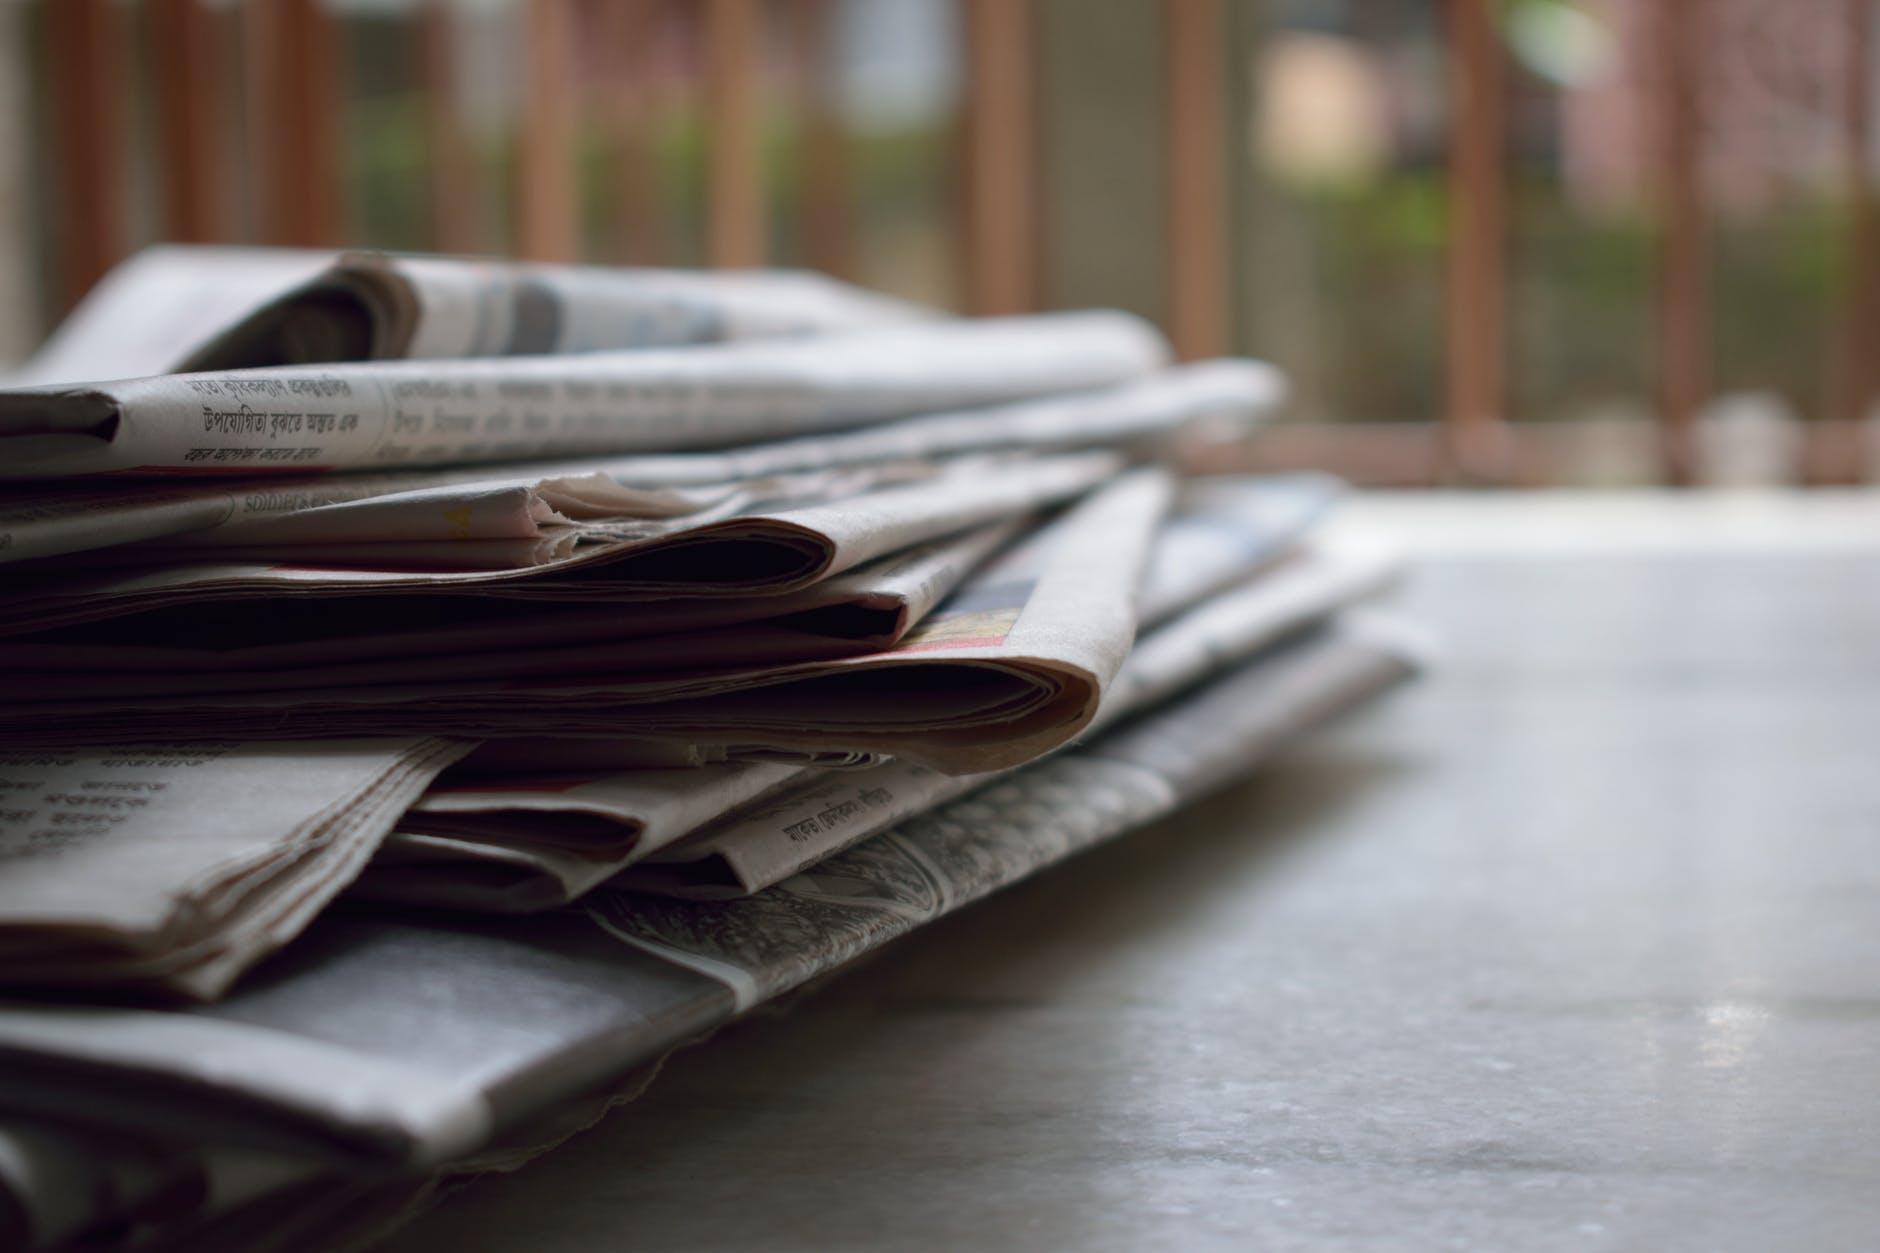 Saham BMTR Milik MNC Media Rontok di Pertengahan September